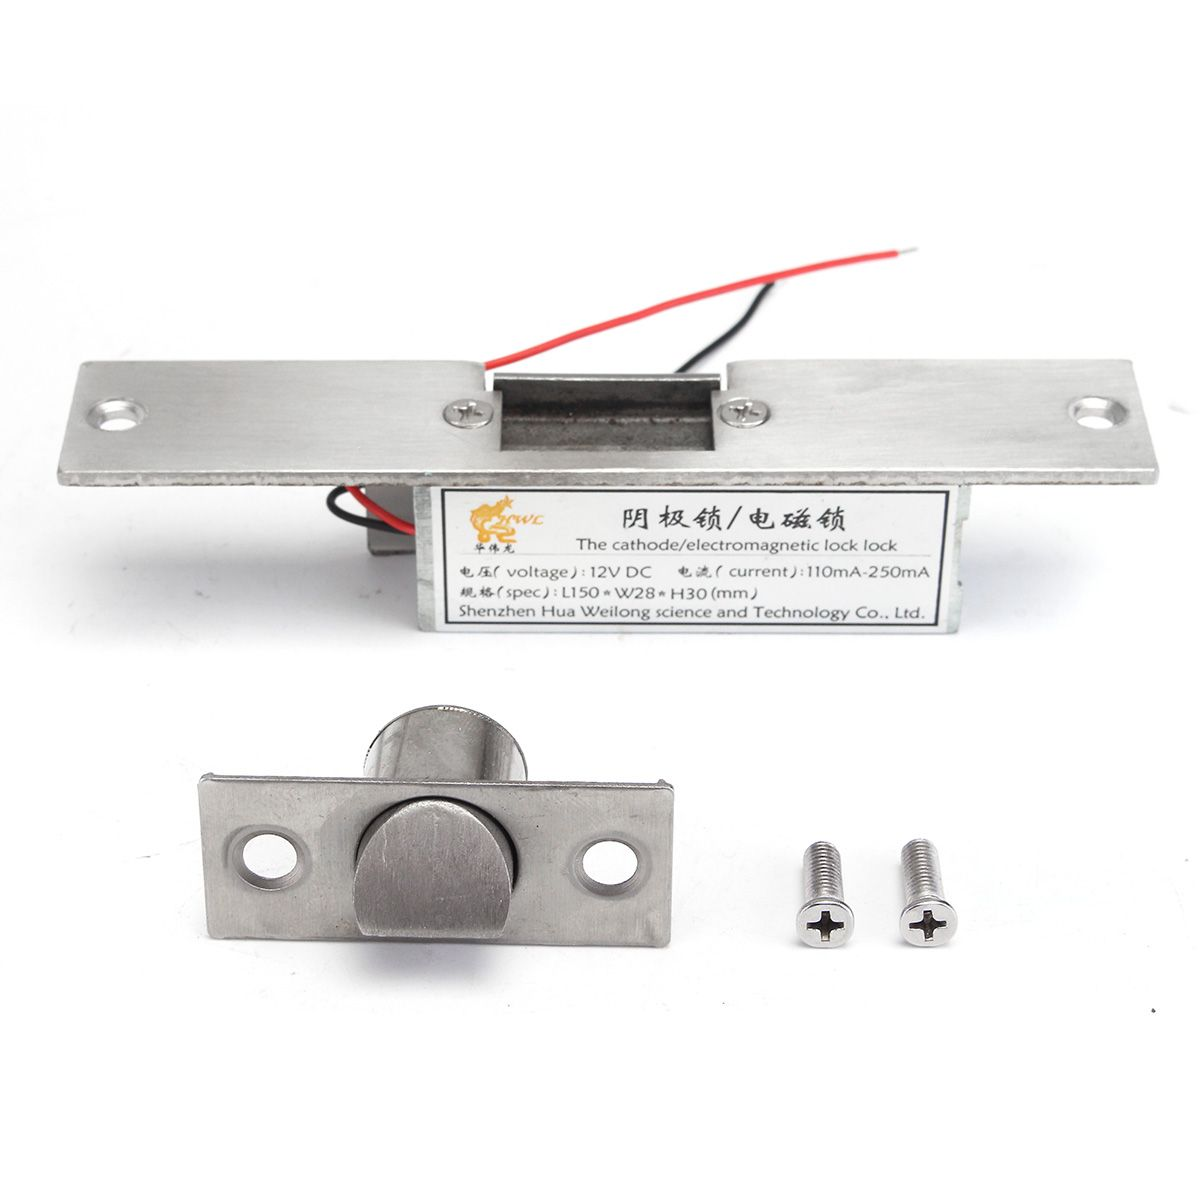 NEUE Safurance 12 v Fail Safe NC Kathode Türöffner Sperre Für Access Control Holz Metall Tür Home Security